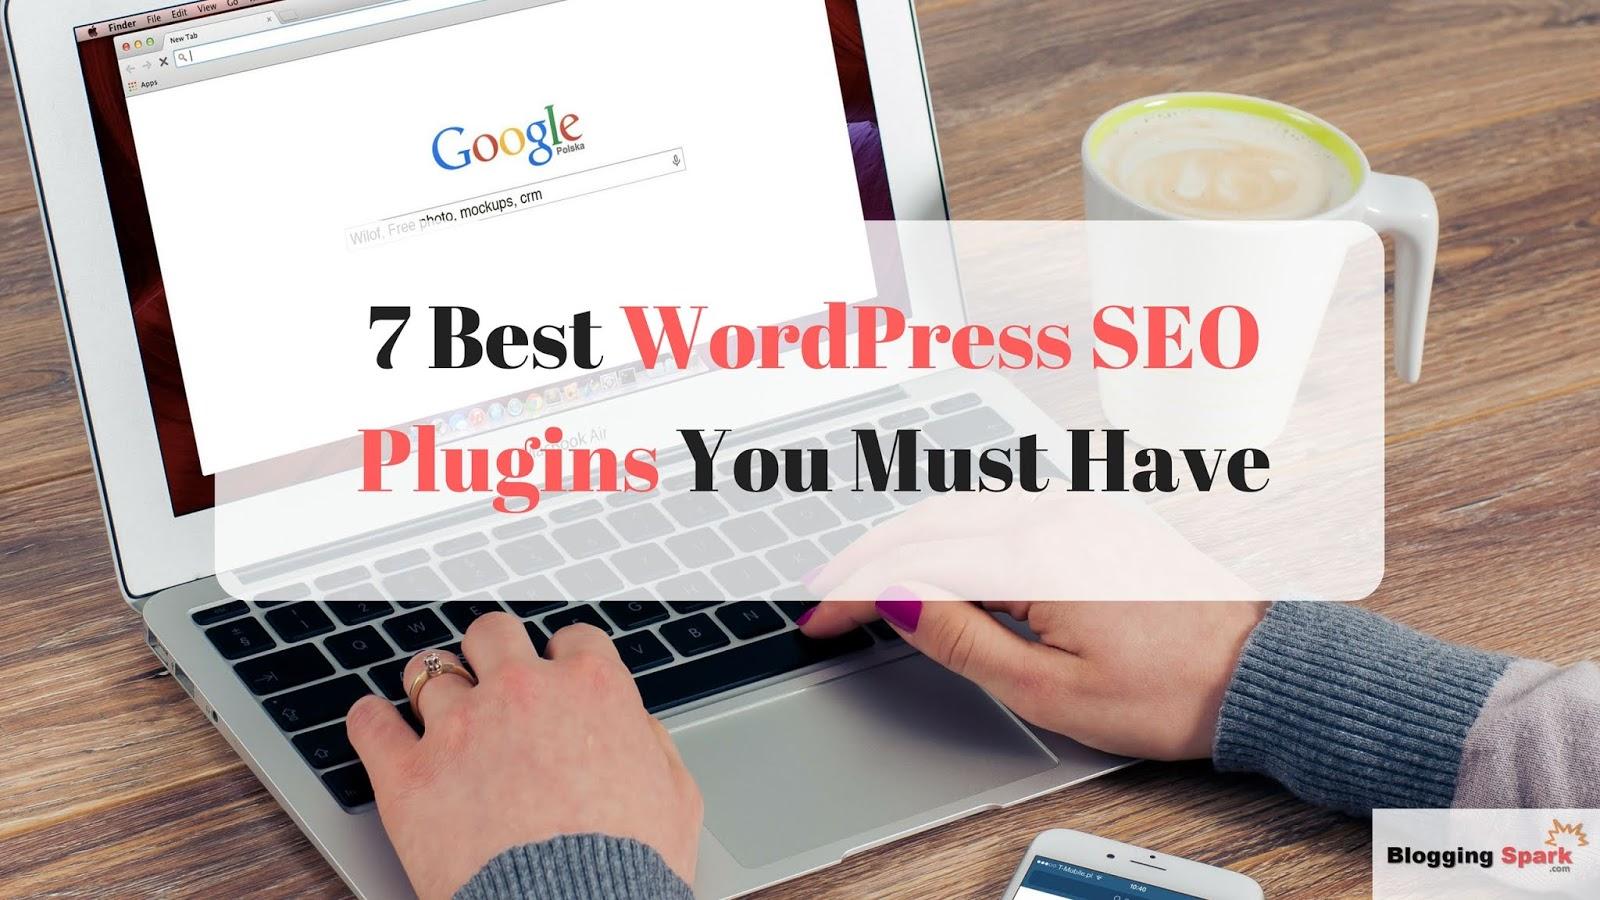 Spark Plugins 350 Engine Belt Diagram 7 Best Wordpress Seo You Must Have In 2019